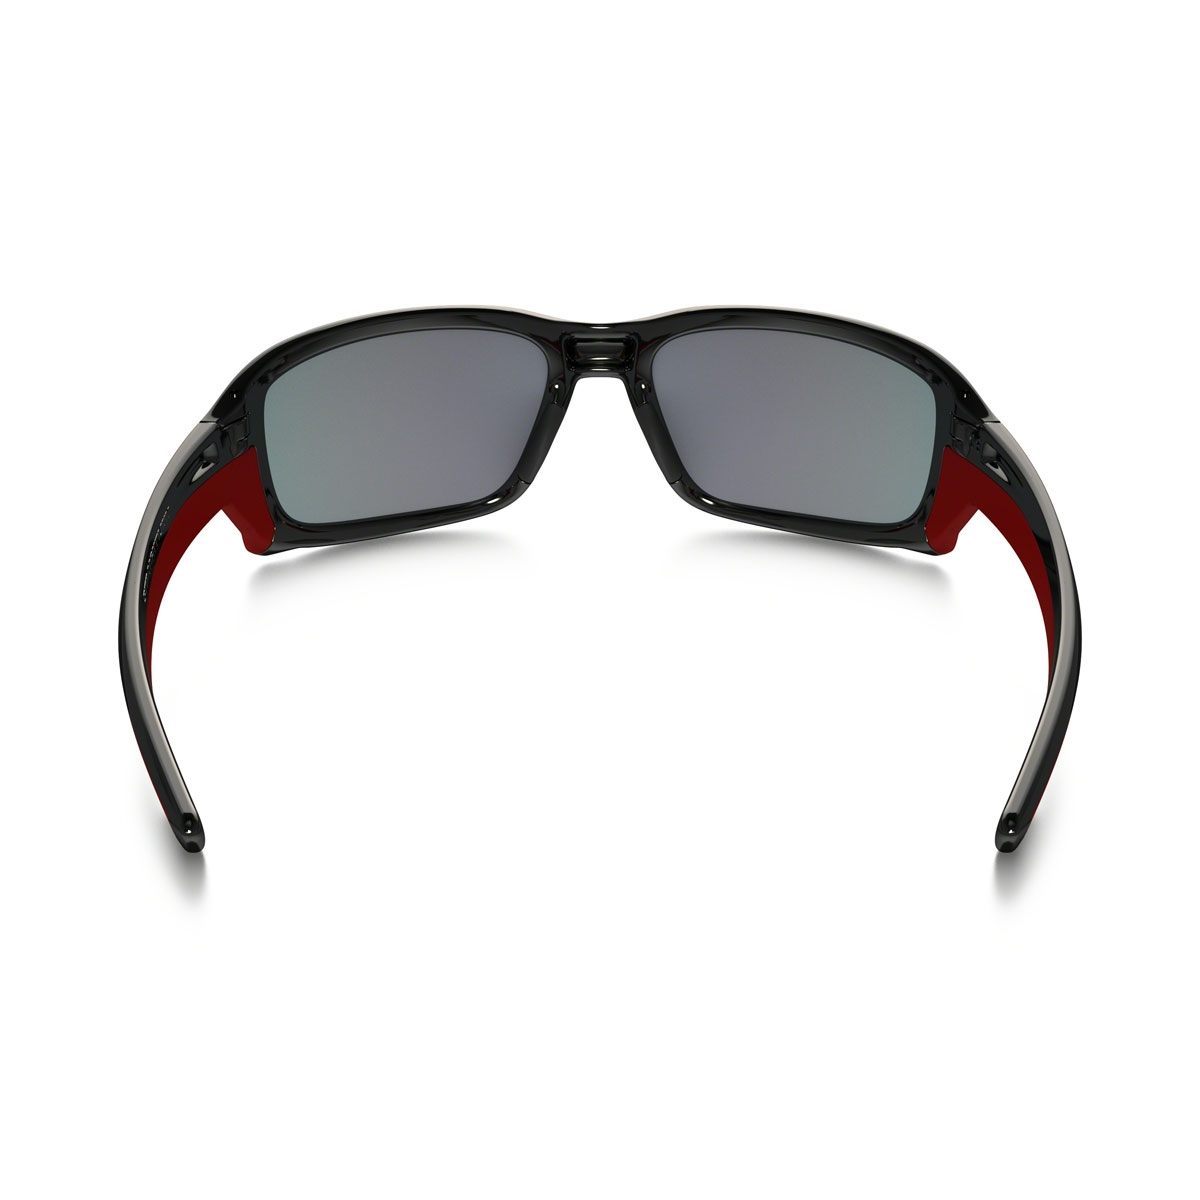 73e1a416424 ... Image of Oakley Straightlink Polarized Men s Sunglasses - Polished Black  Frame Torch Iridium Polarized Lens ...